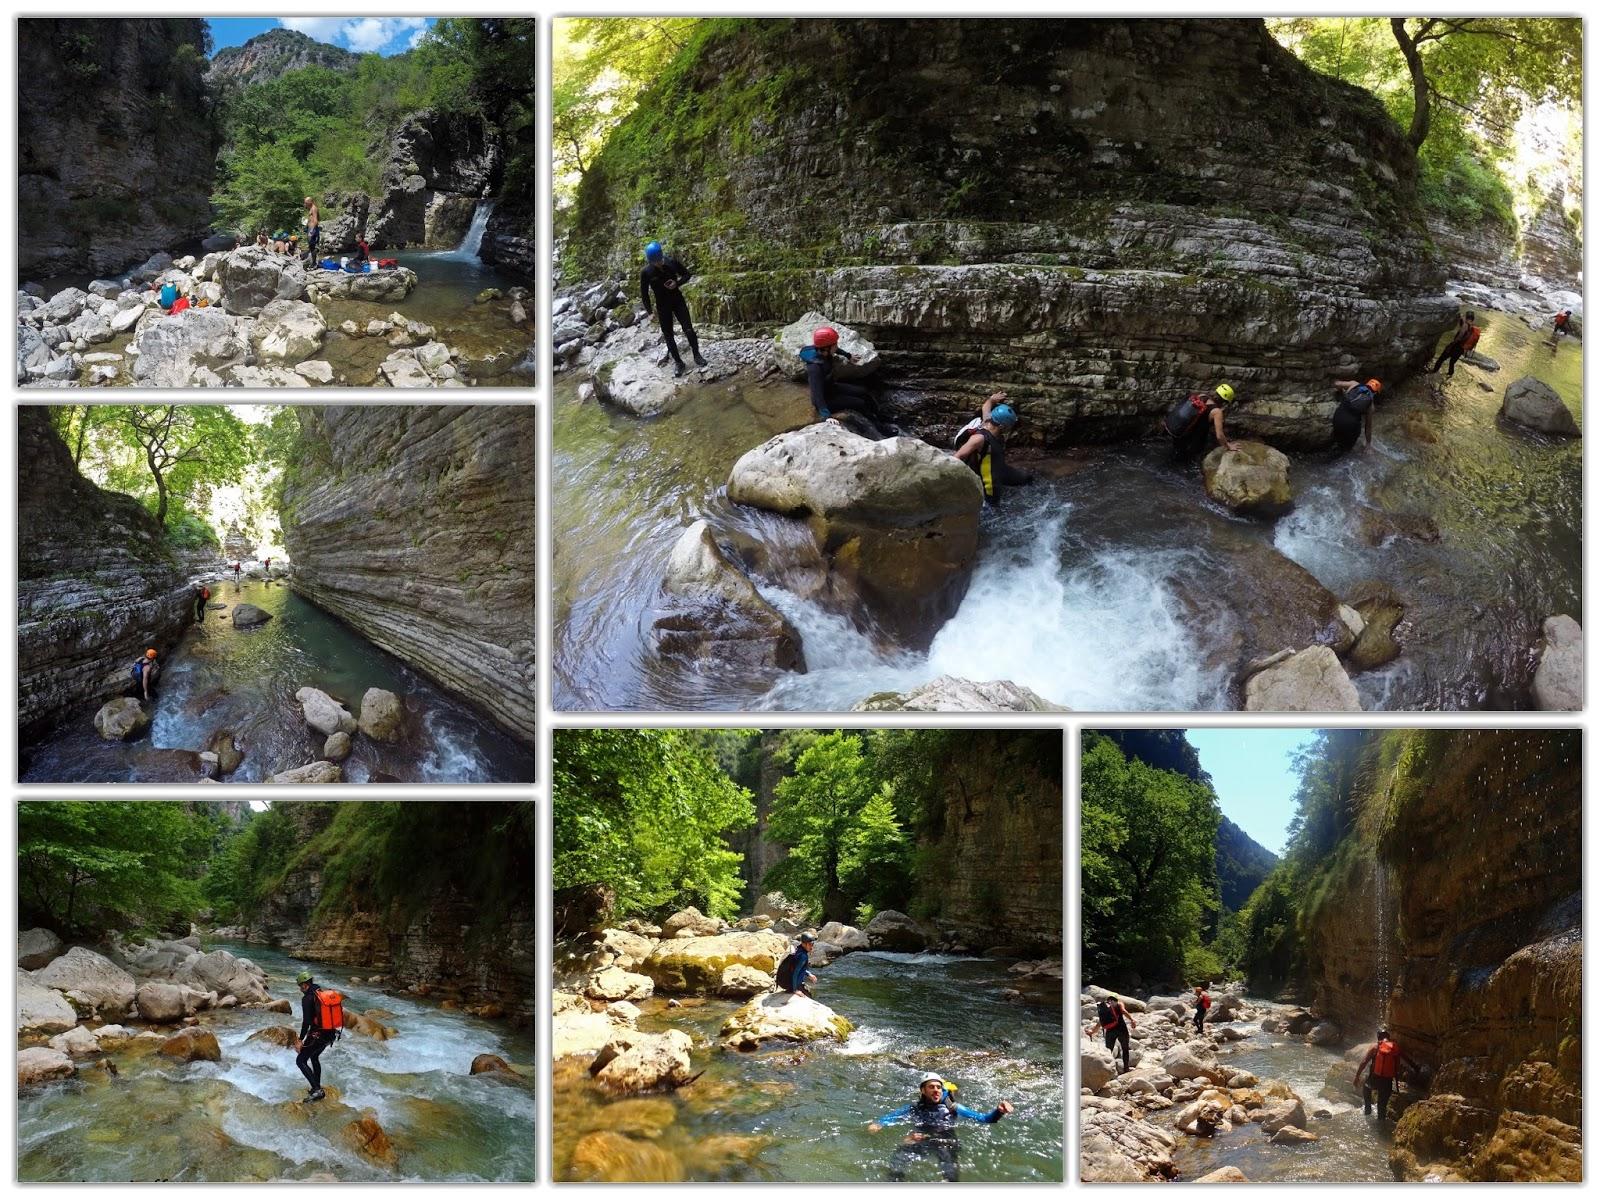 64425c9aae Ο Καλαρρύτικος ποταμός πηγάζει από τους ορεινούς όγκους της Κακαρδίτσας και  του Περιστερίου και είναι σημαντικός παραπόταμος του Αράχθου. Τρία κύρια ...